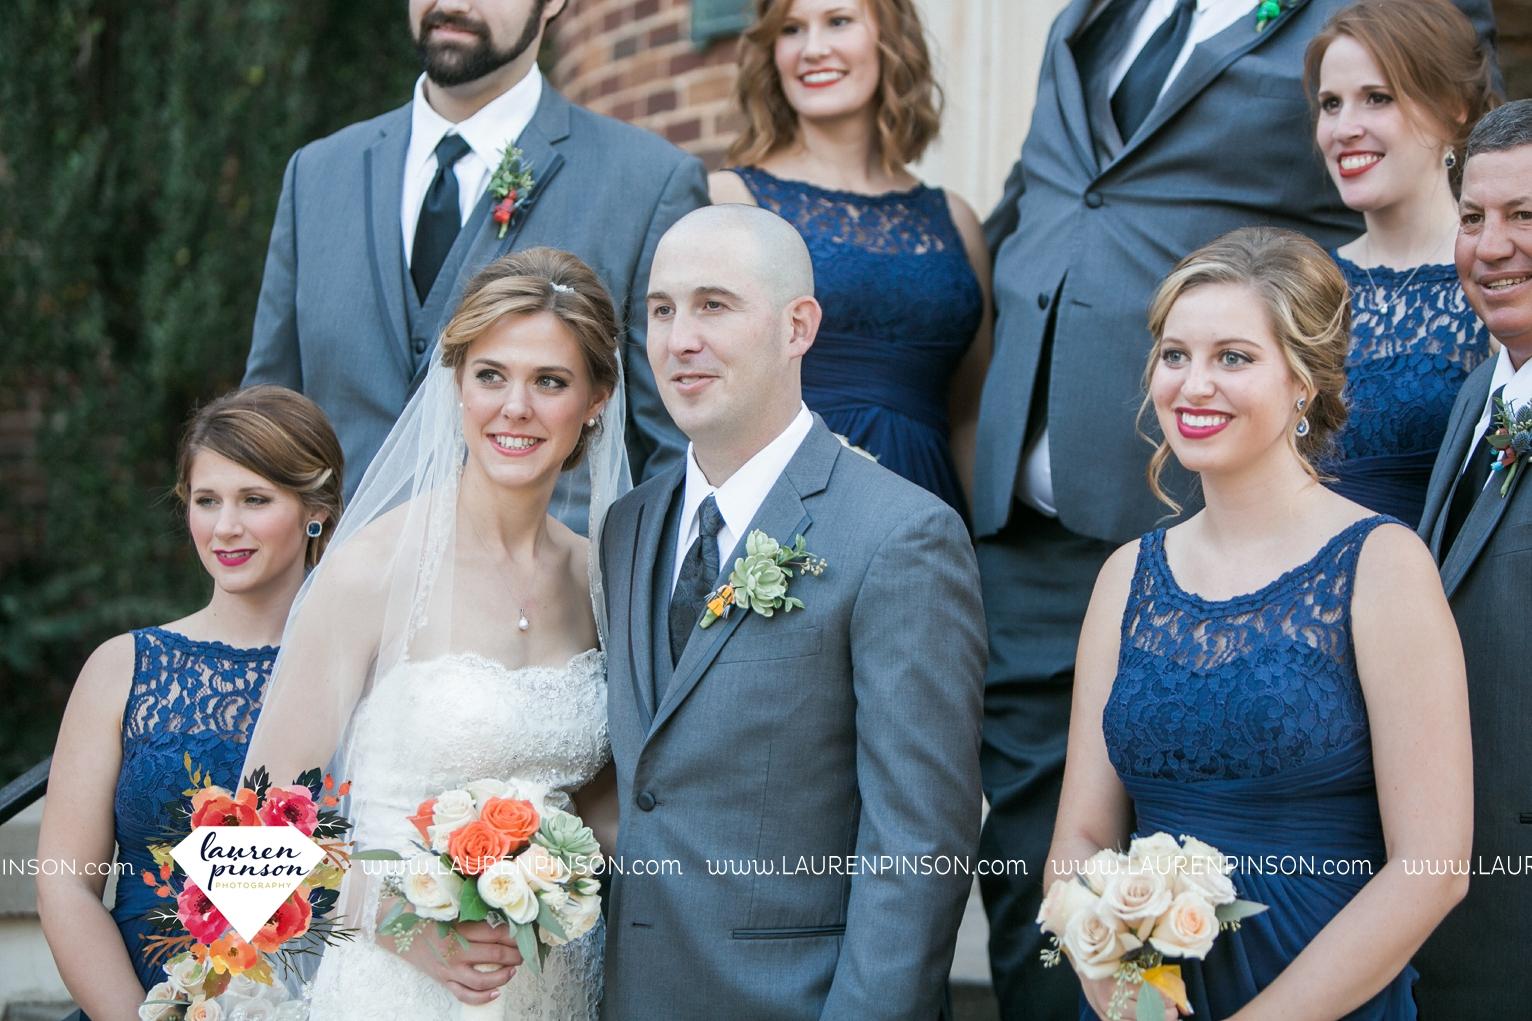 kemp-center-for-the-arts-wichita-falls-texas-wedding-photographer-fall-wedding-pumpkins-179.jpg